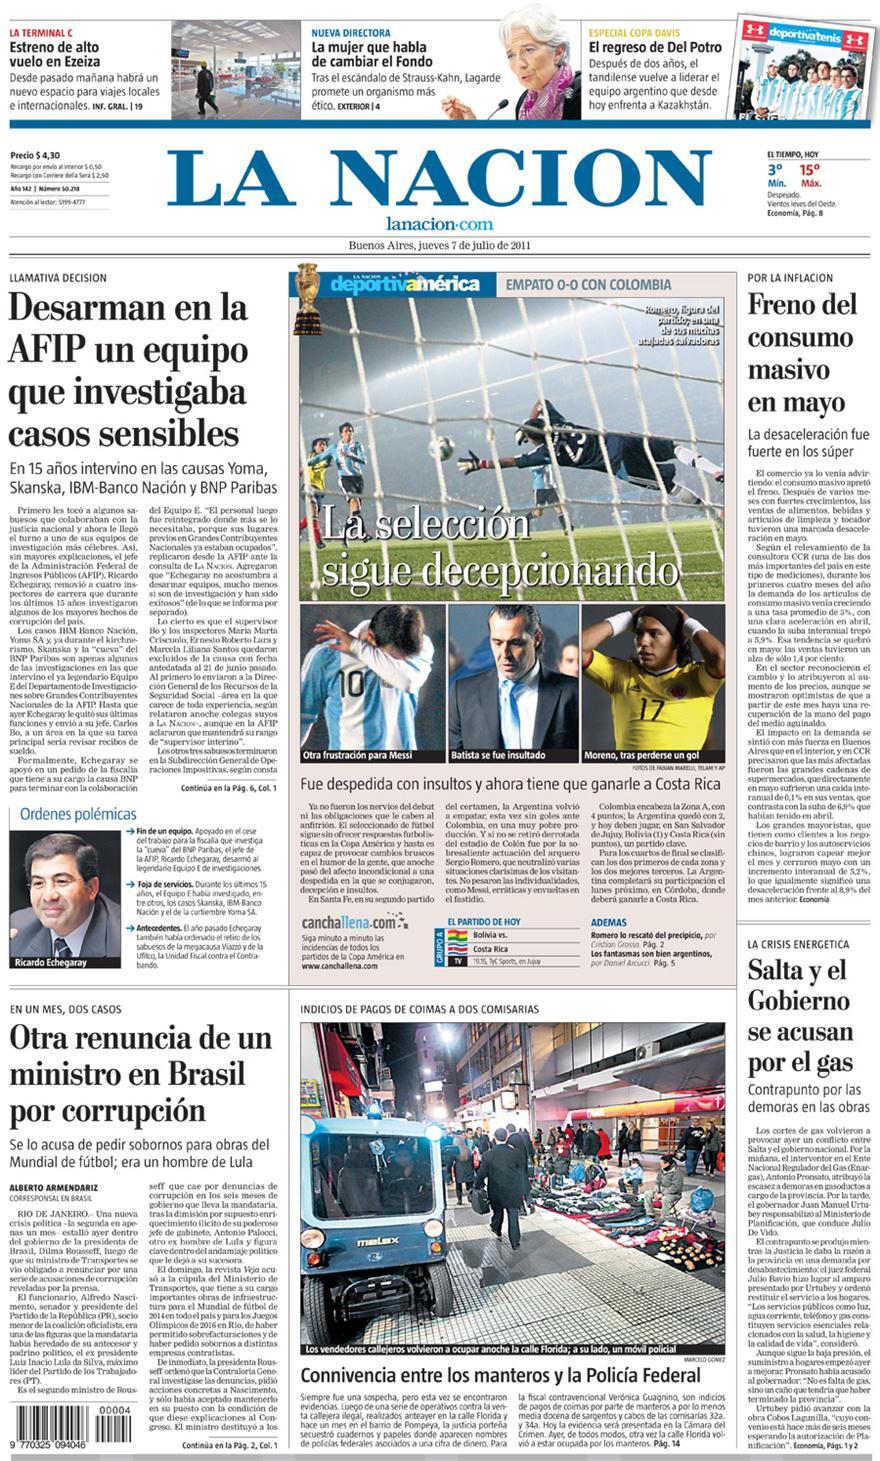 Tapa diarios la nacion clarin 07 07 11 report show for Diarios del espectaculo